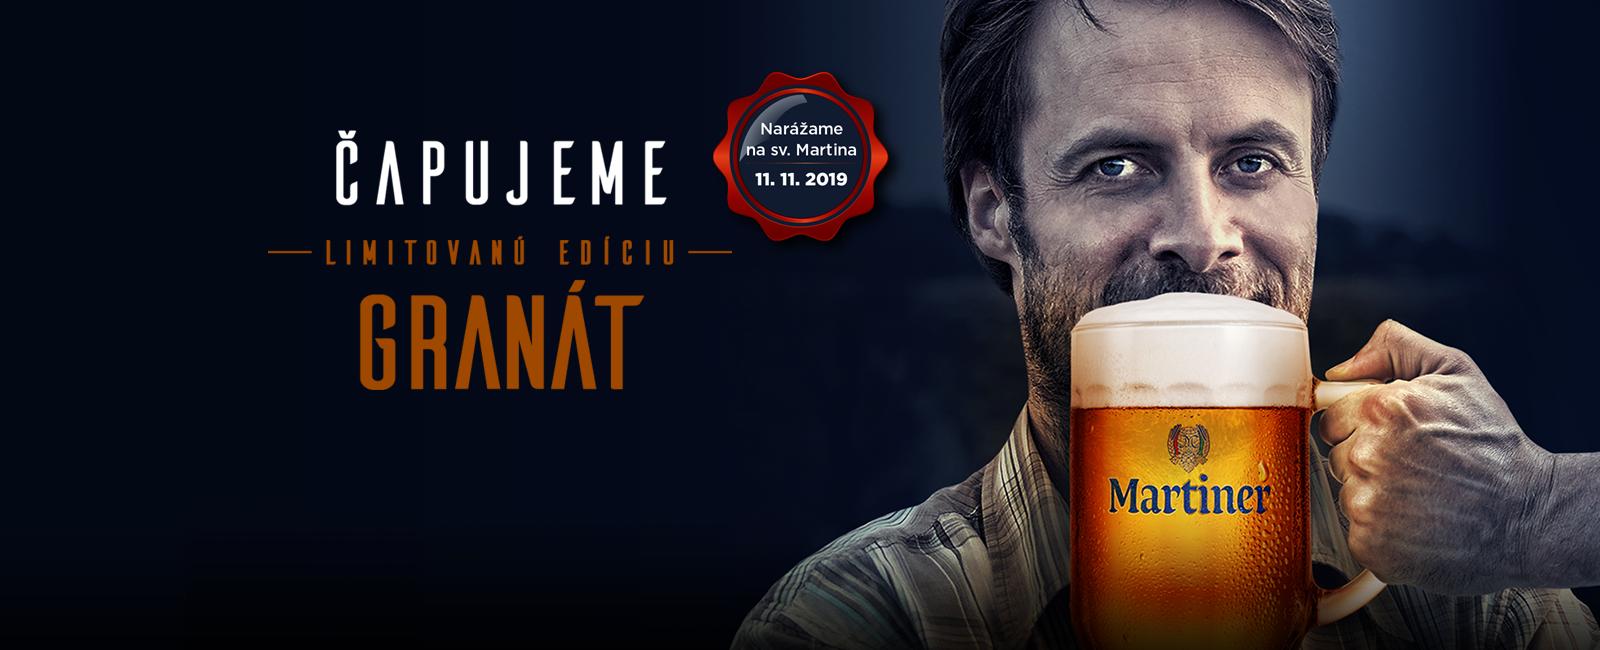 Kvalitné slovenské pivo | Martiner granát